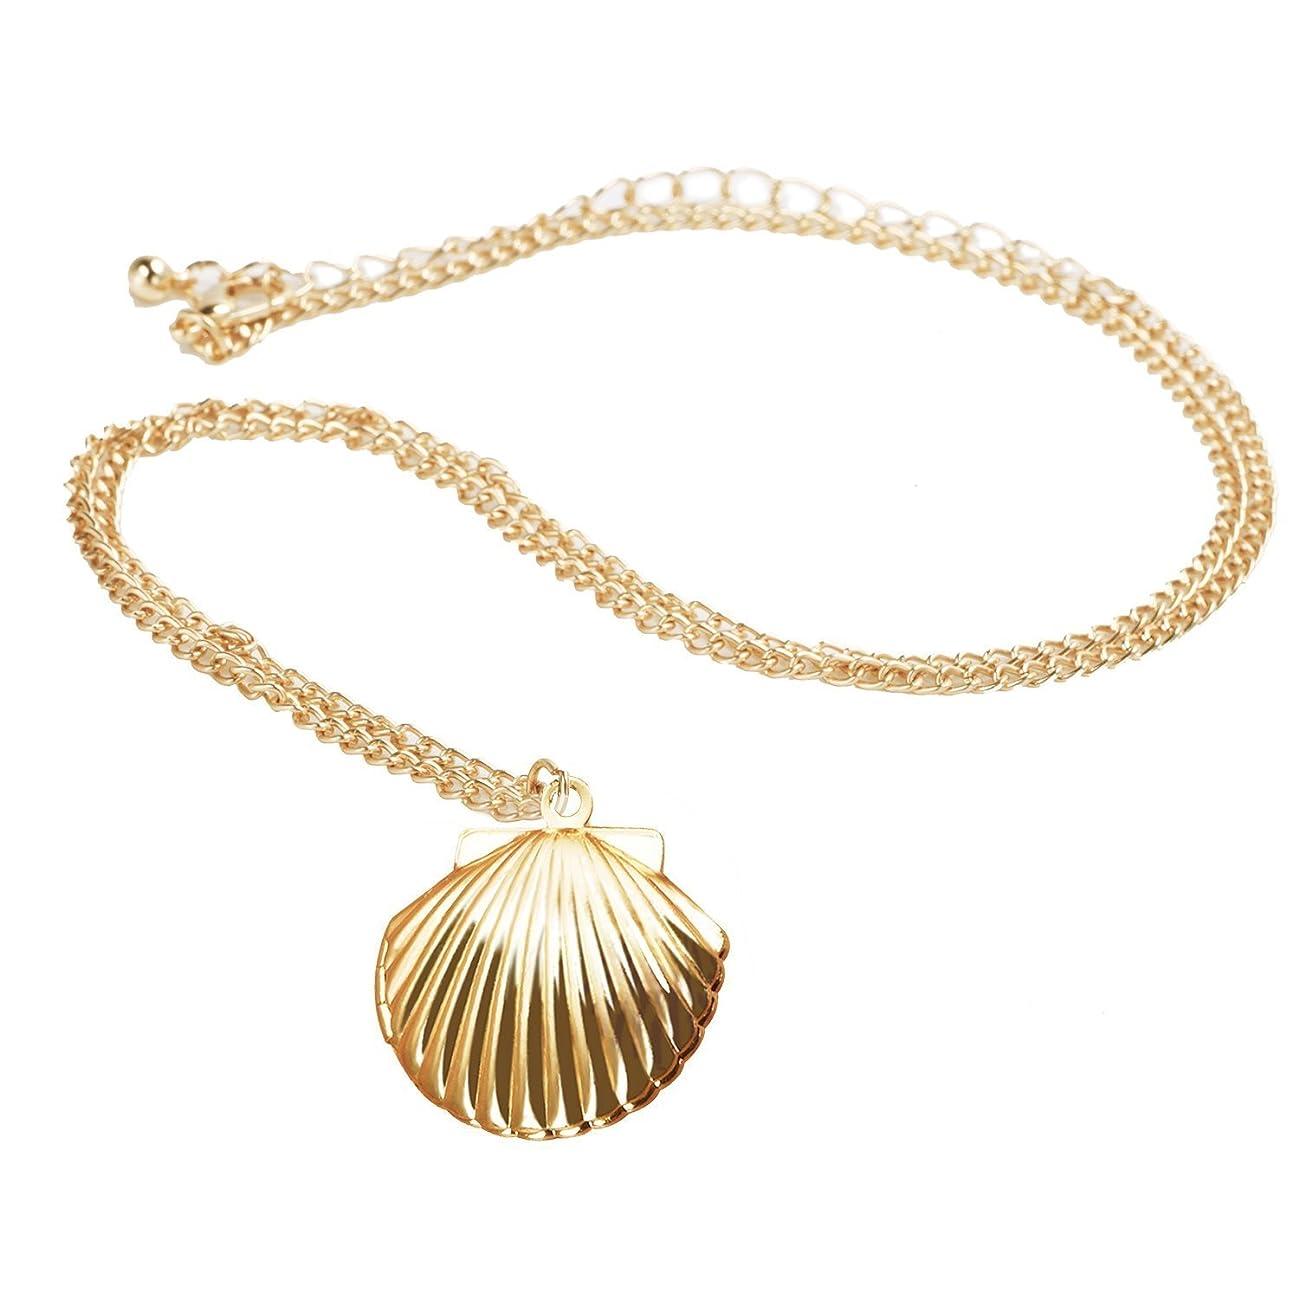 Sea Shell Locket, Mermaid Valentine Necklace, Beach Locket, Gold Tone Brass, Nautical Jewelry For Women, Girls, Party Favor